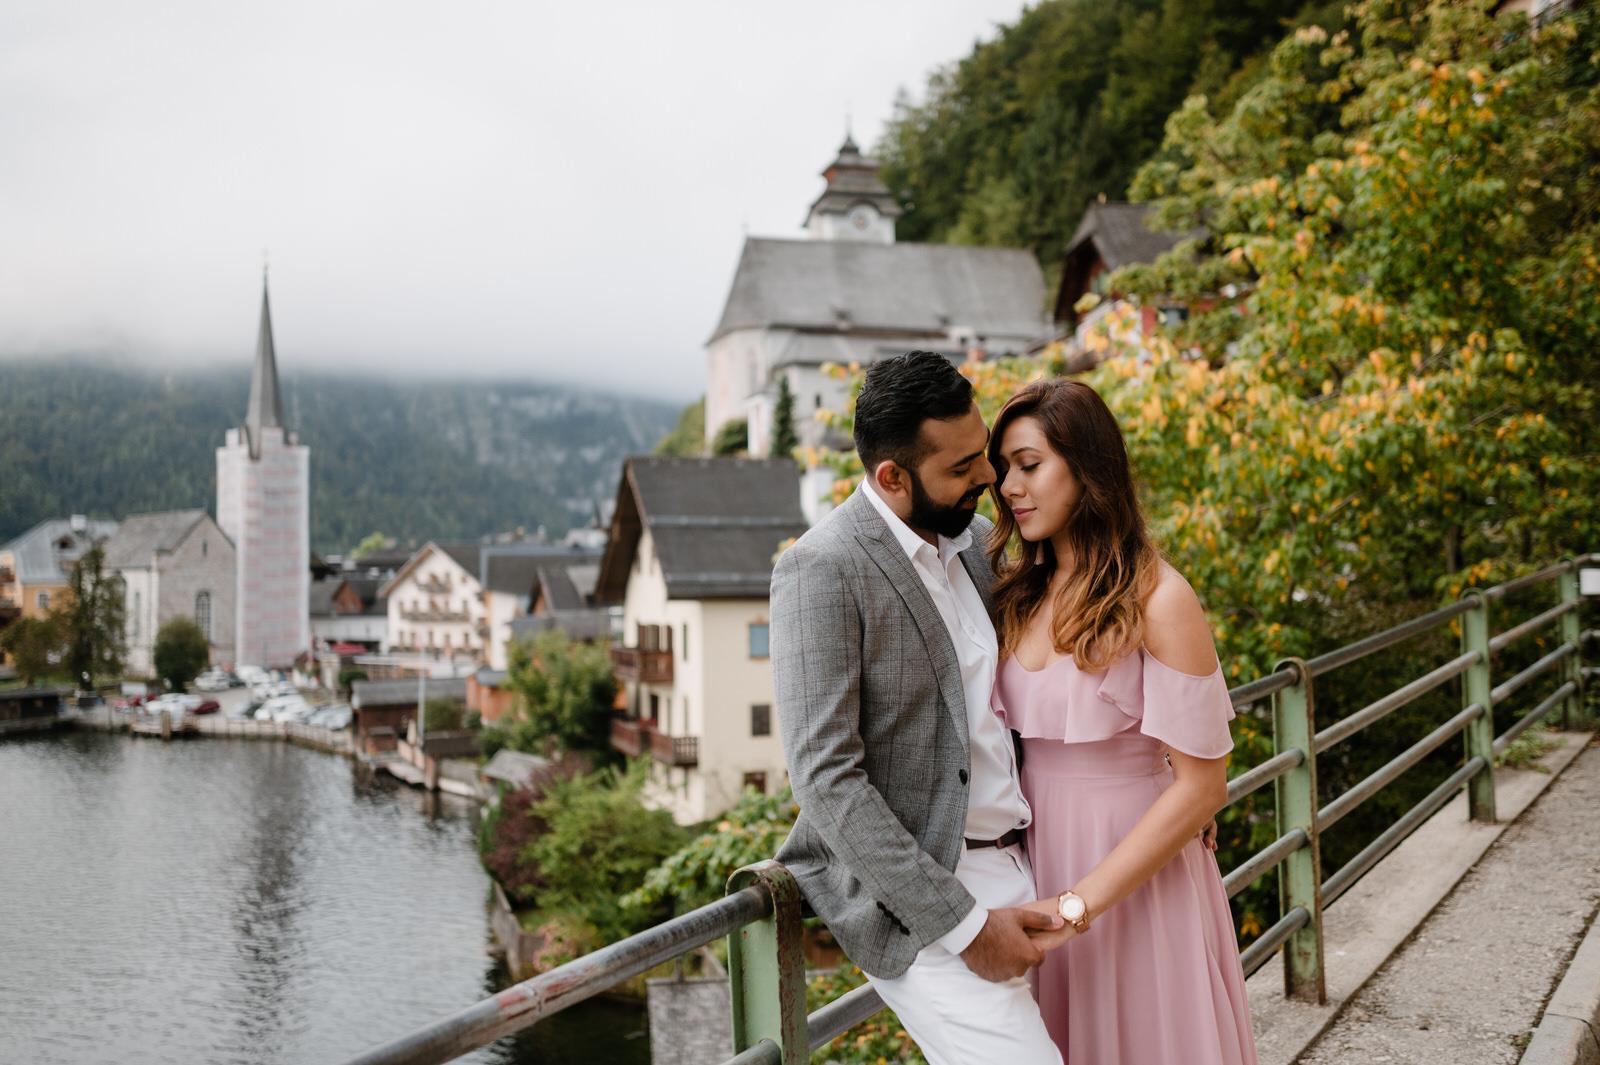 couple standing at the most popular sight in Hallstatt